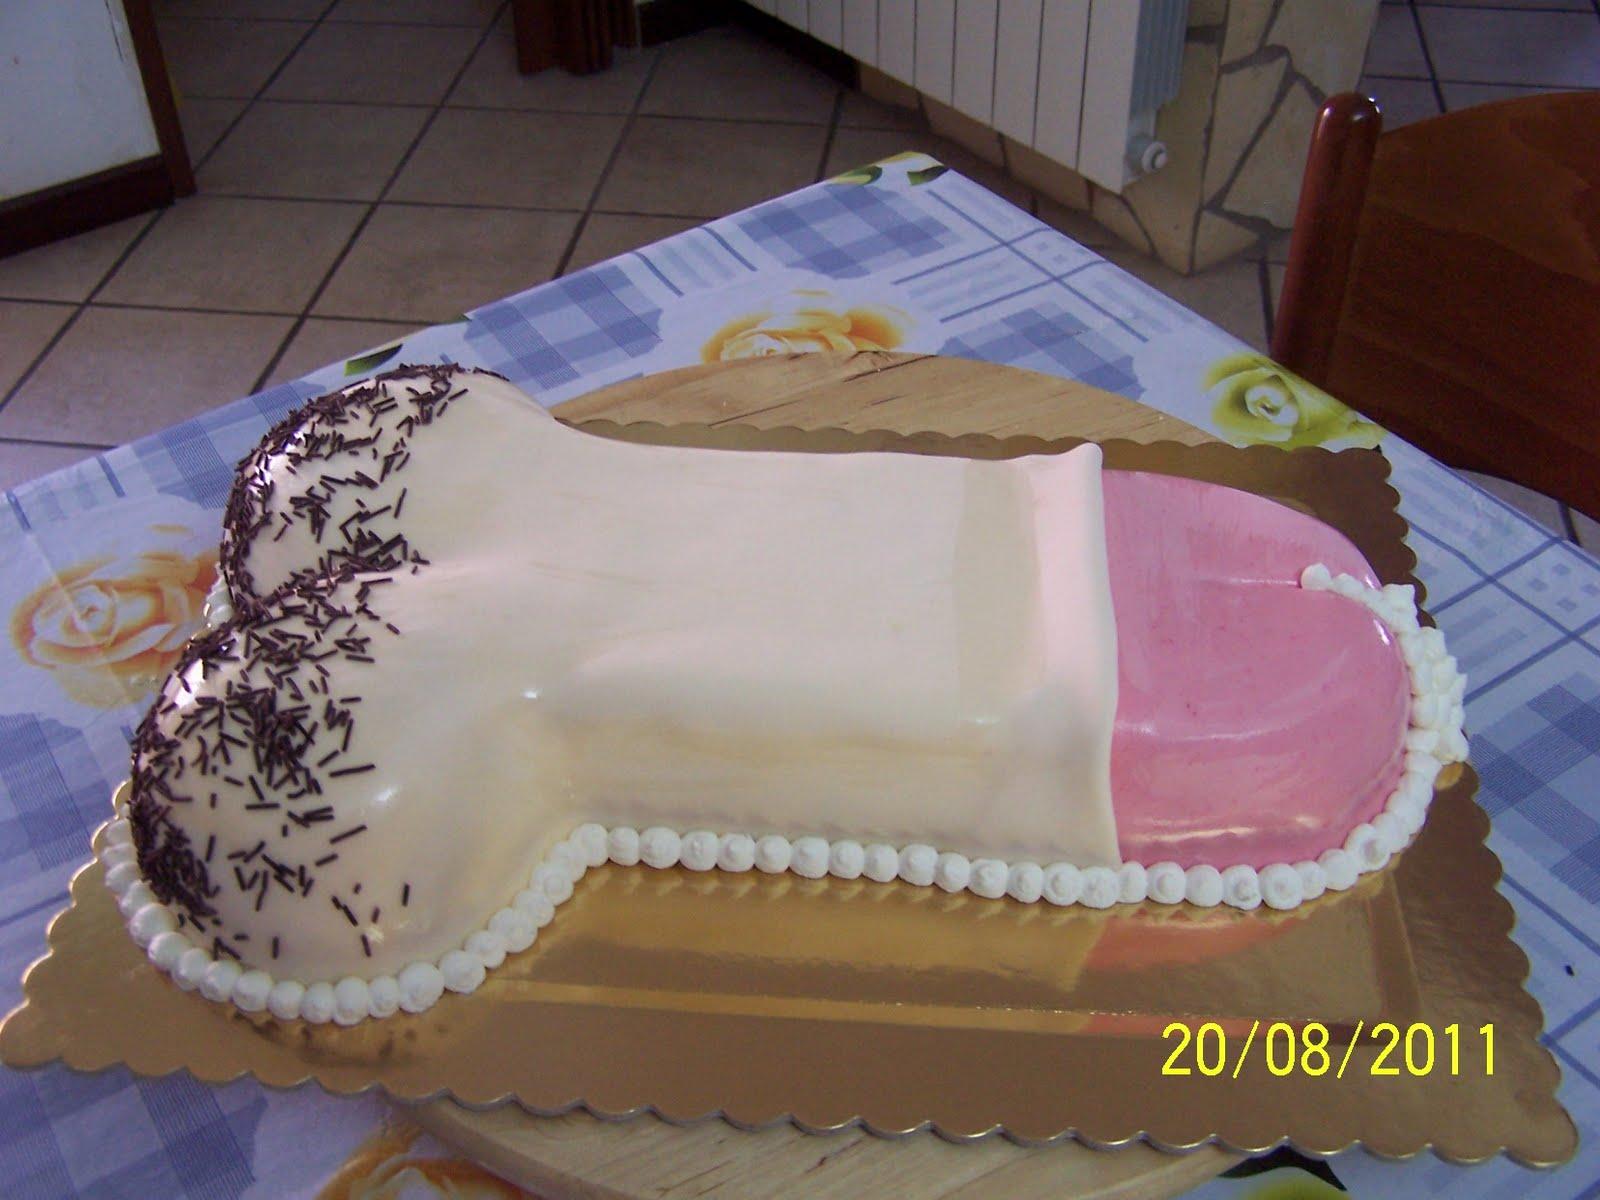 Conosciuto dolcementemanu: torta addio al nubilato!!!!!!!! ZJ17